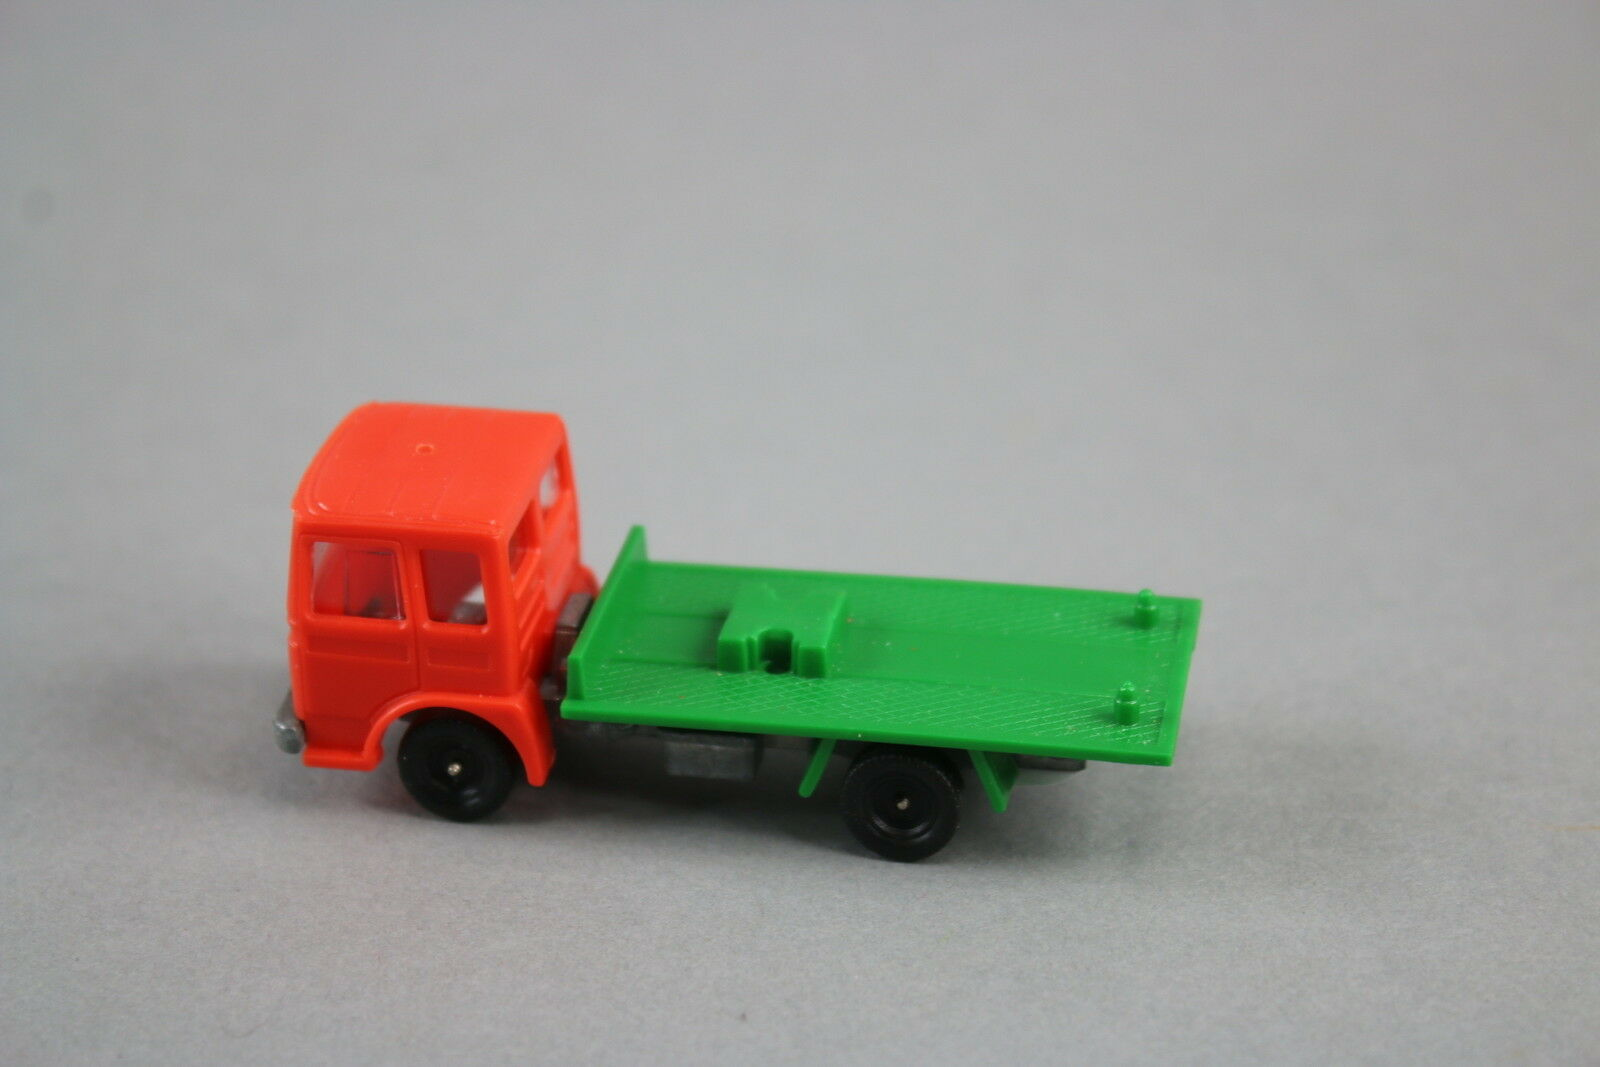 V575 Champion 73mm camion saviem SM 300 plateau championnette transport avion